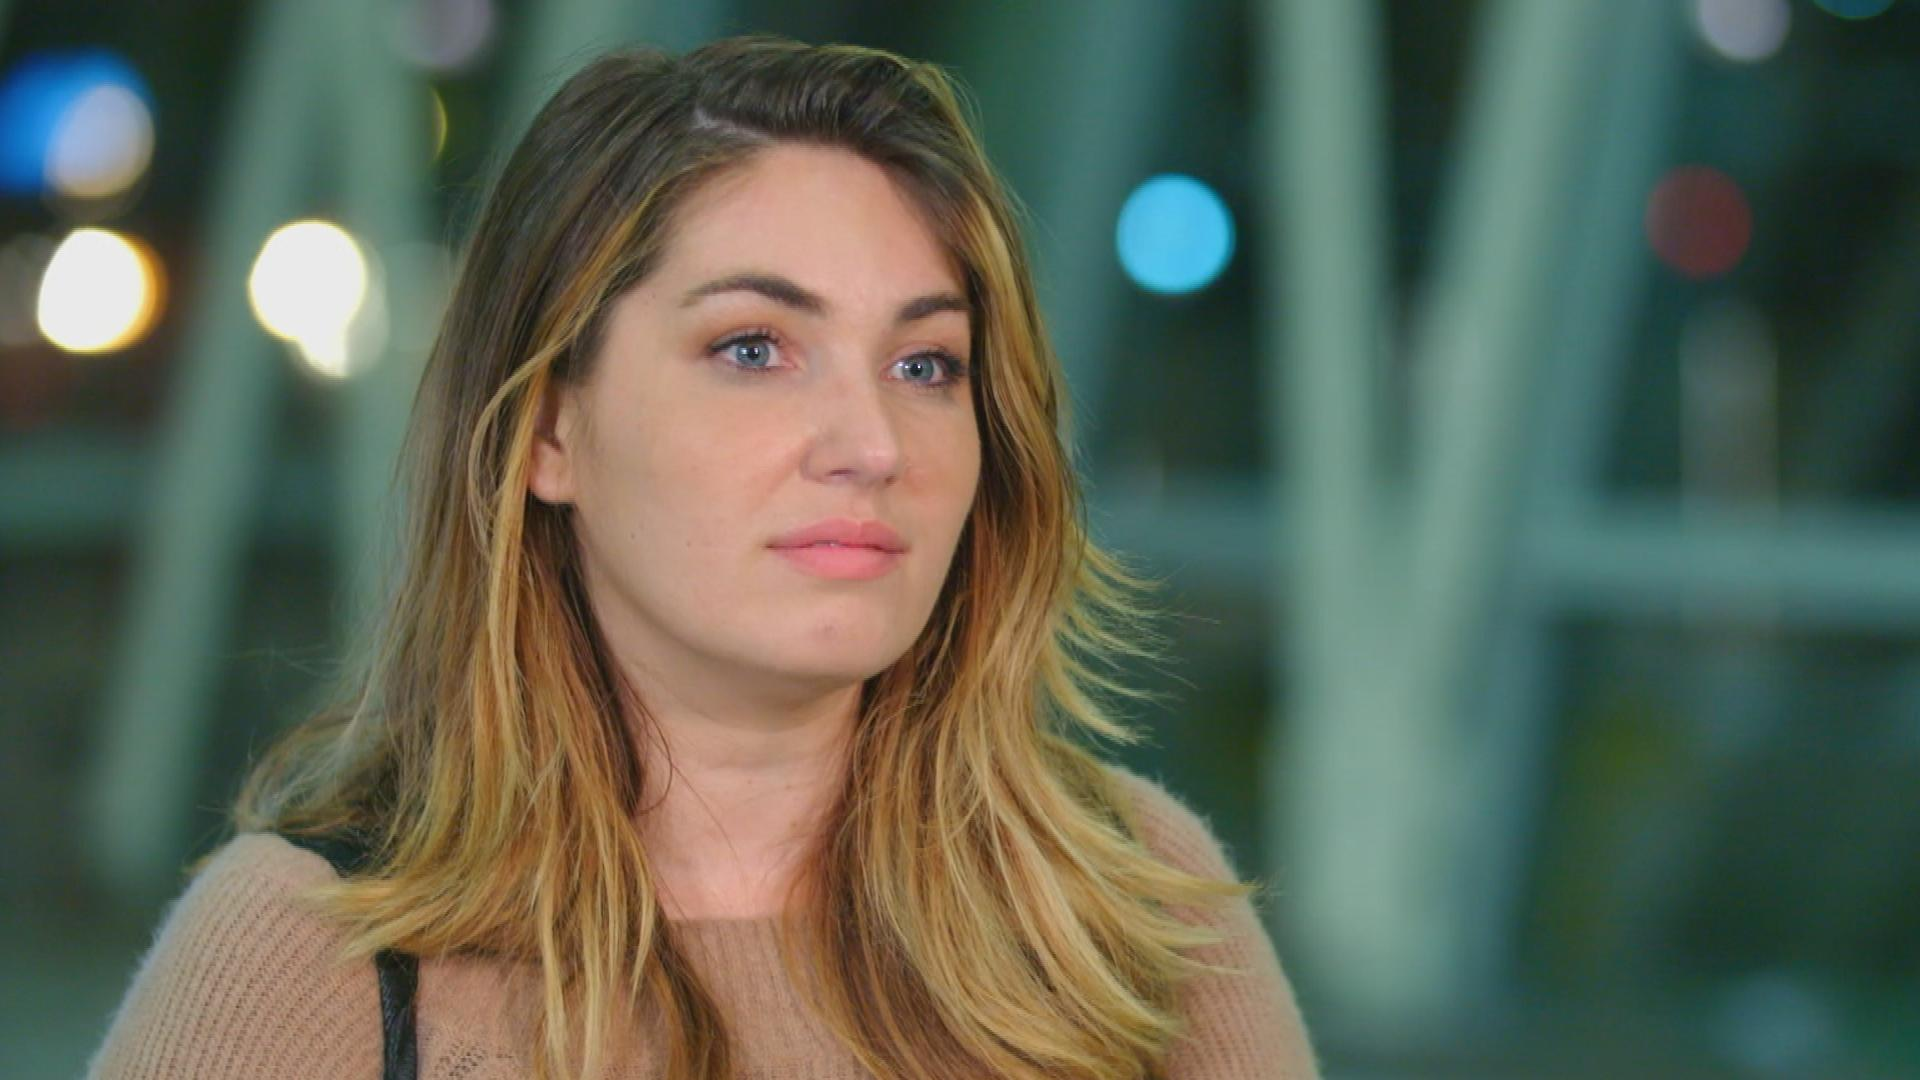 '90 Day Fiance': Stephanie Reunites With Her Mom After Emotional Trip